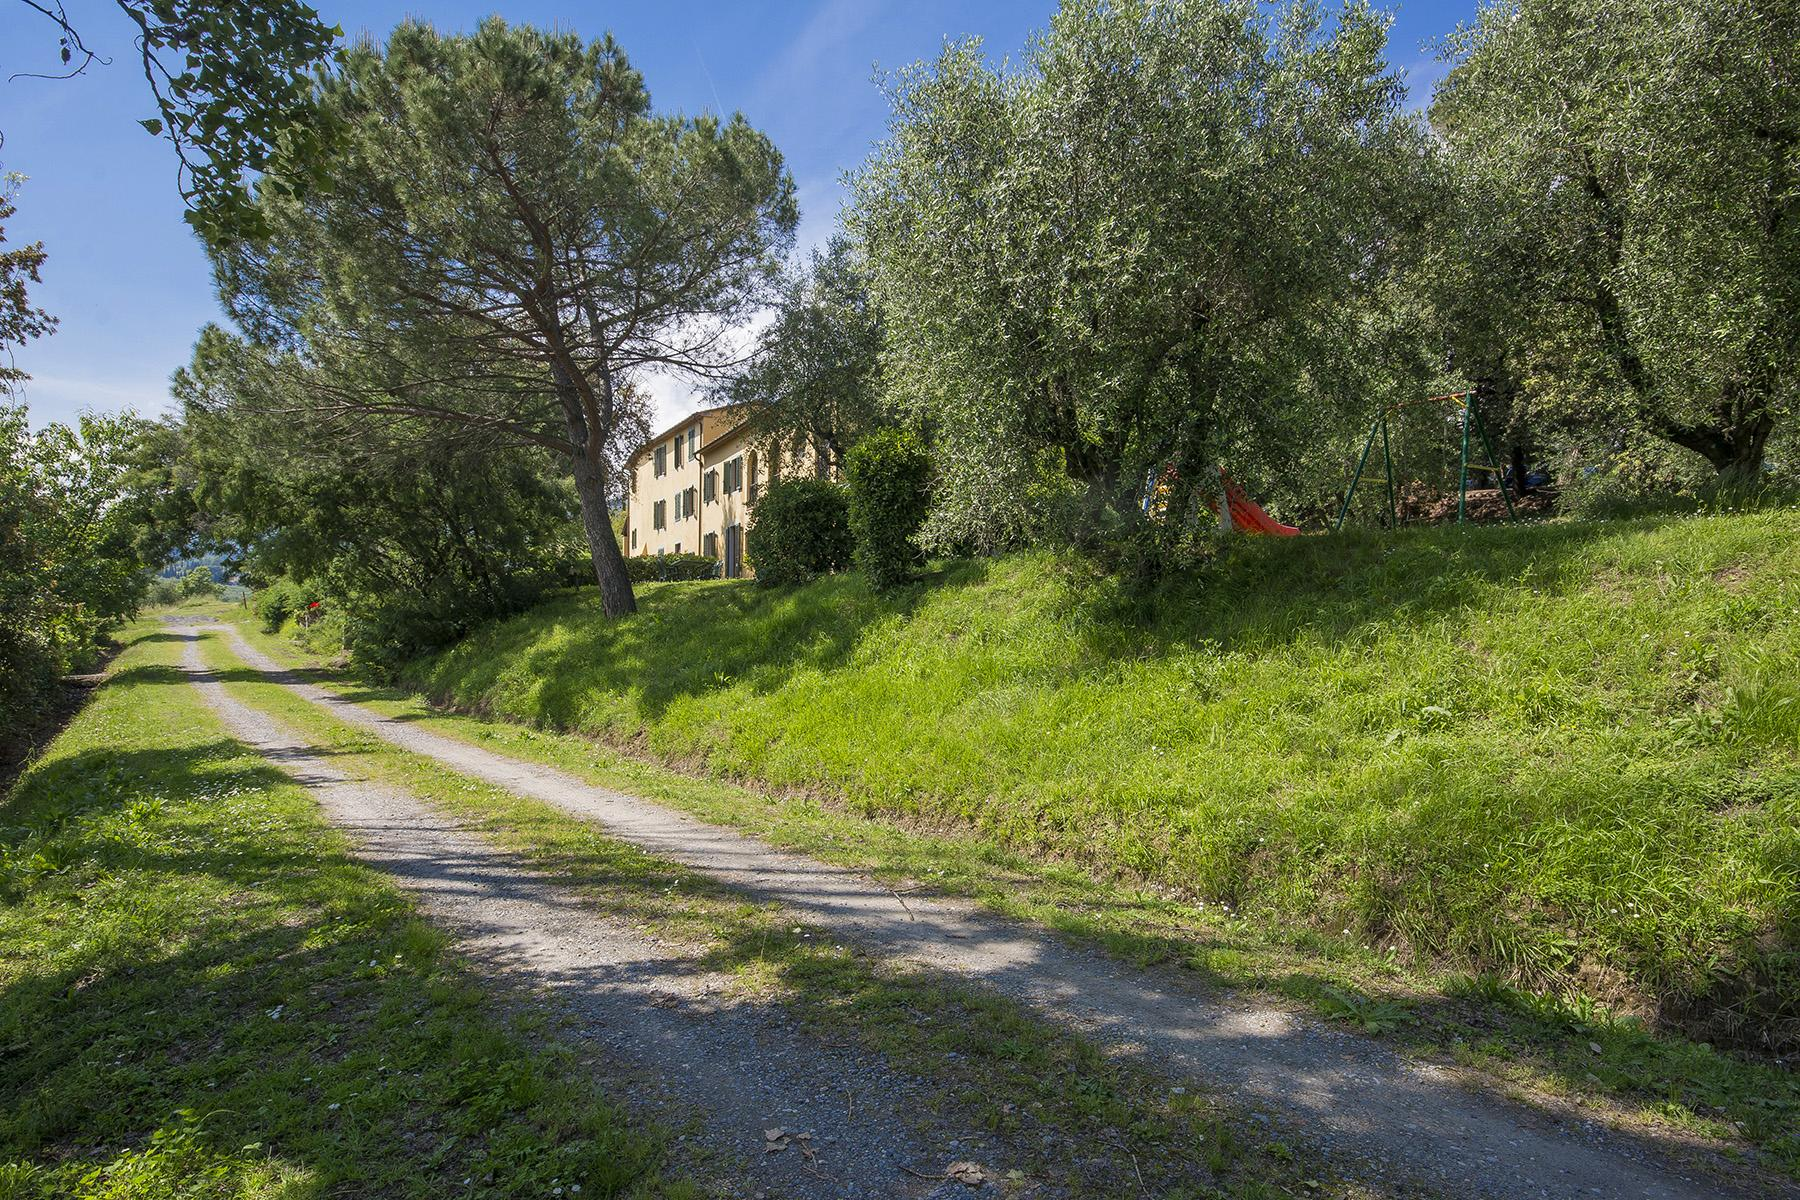 Pescia小山丘上美丽的乡间农舍 - 46